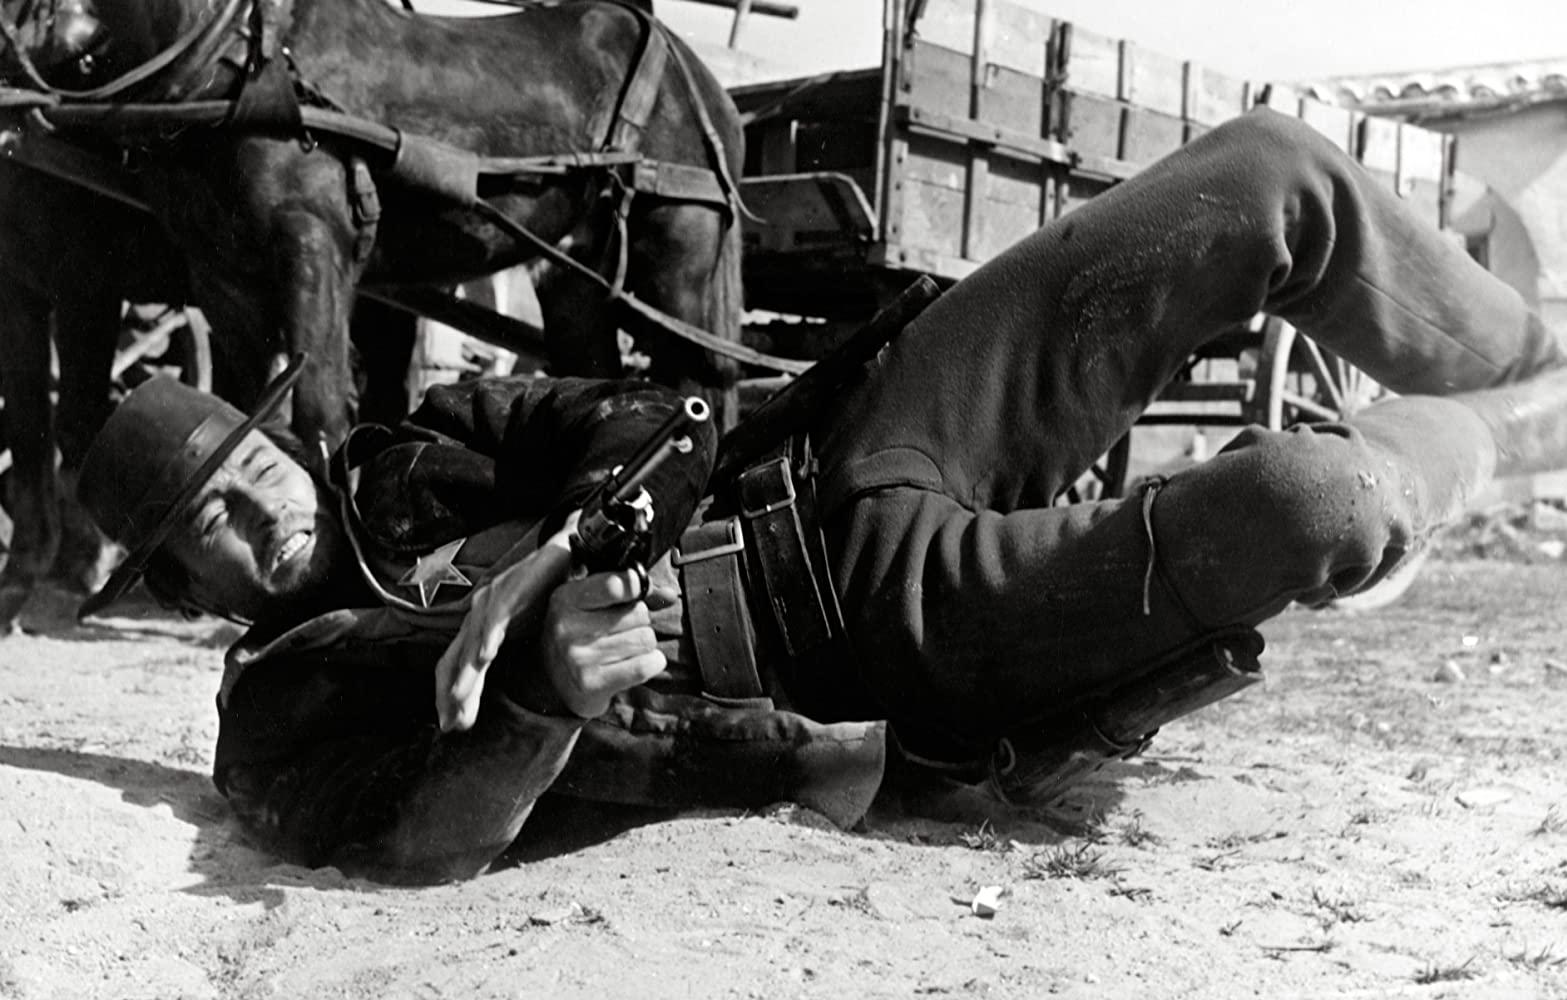 Anthony Steffen in Pochi Dollari per Django